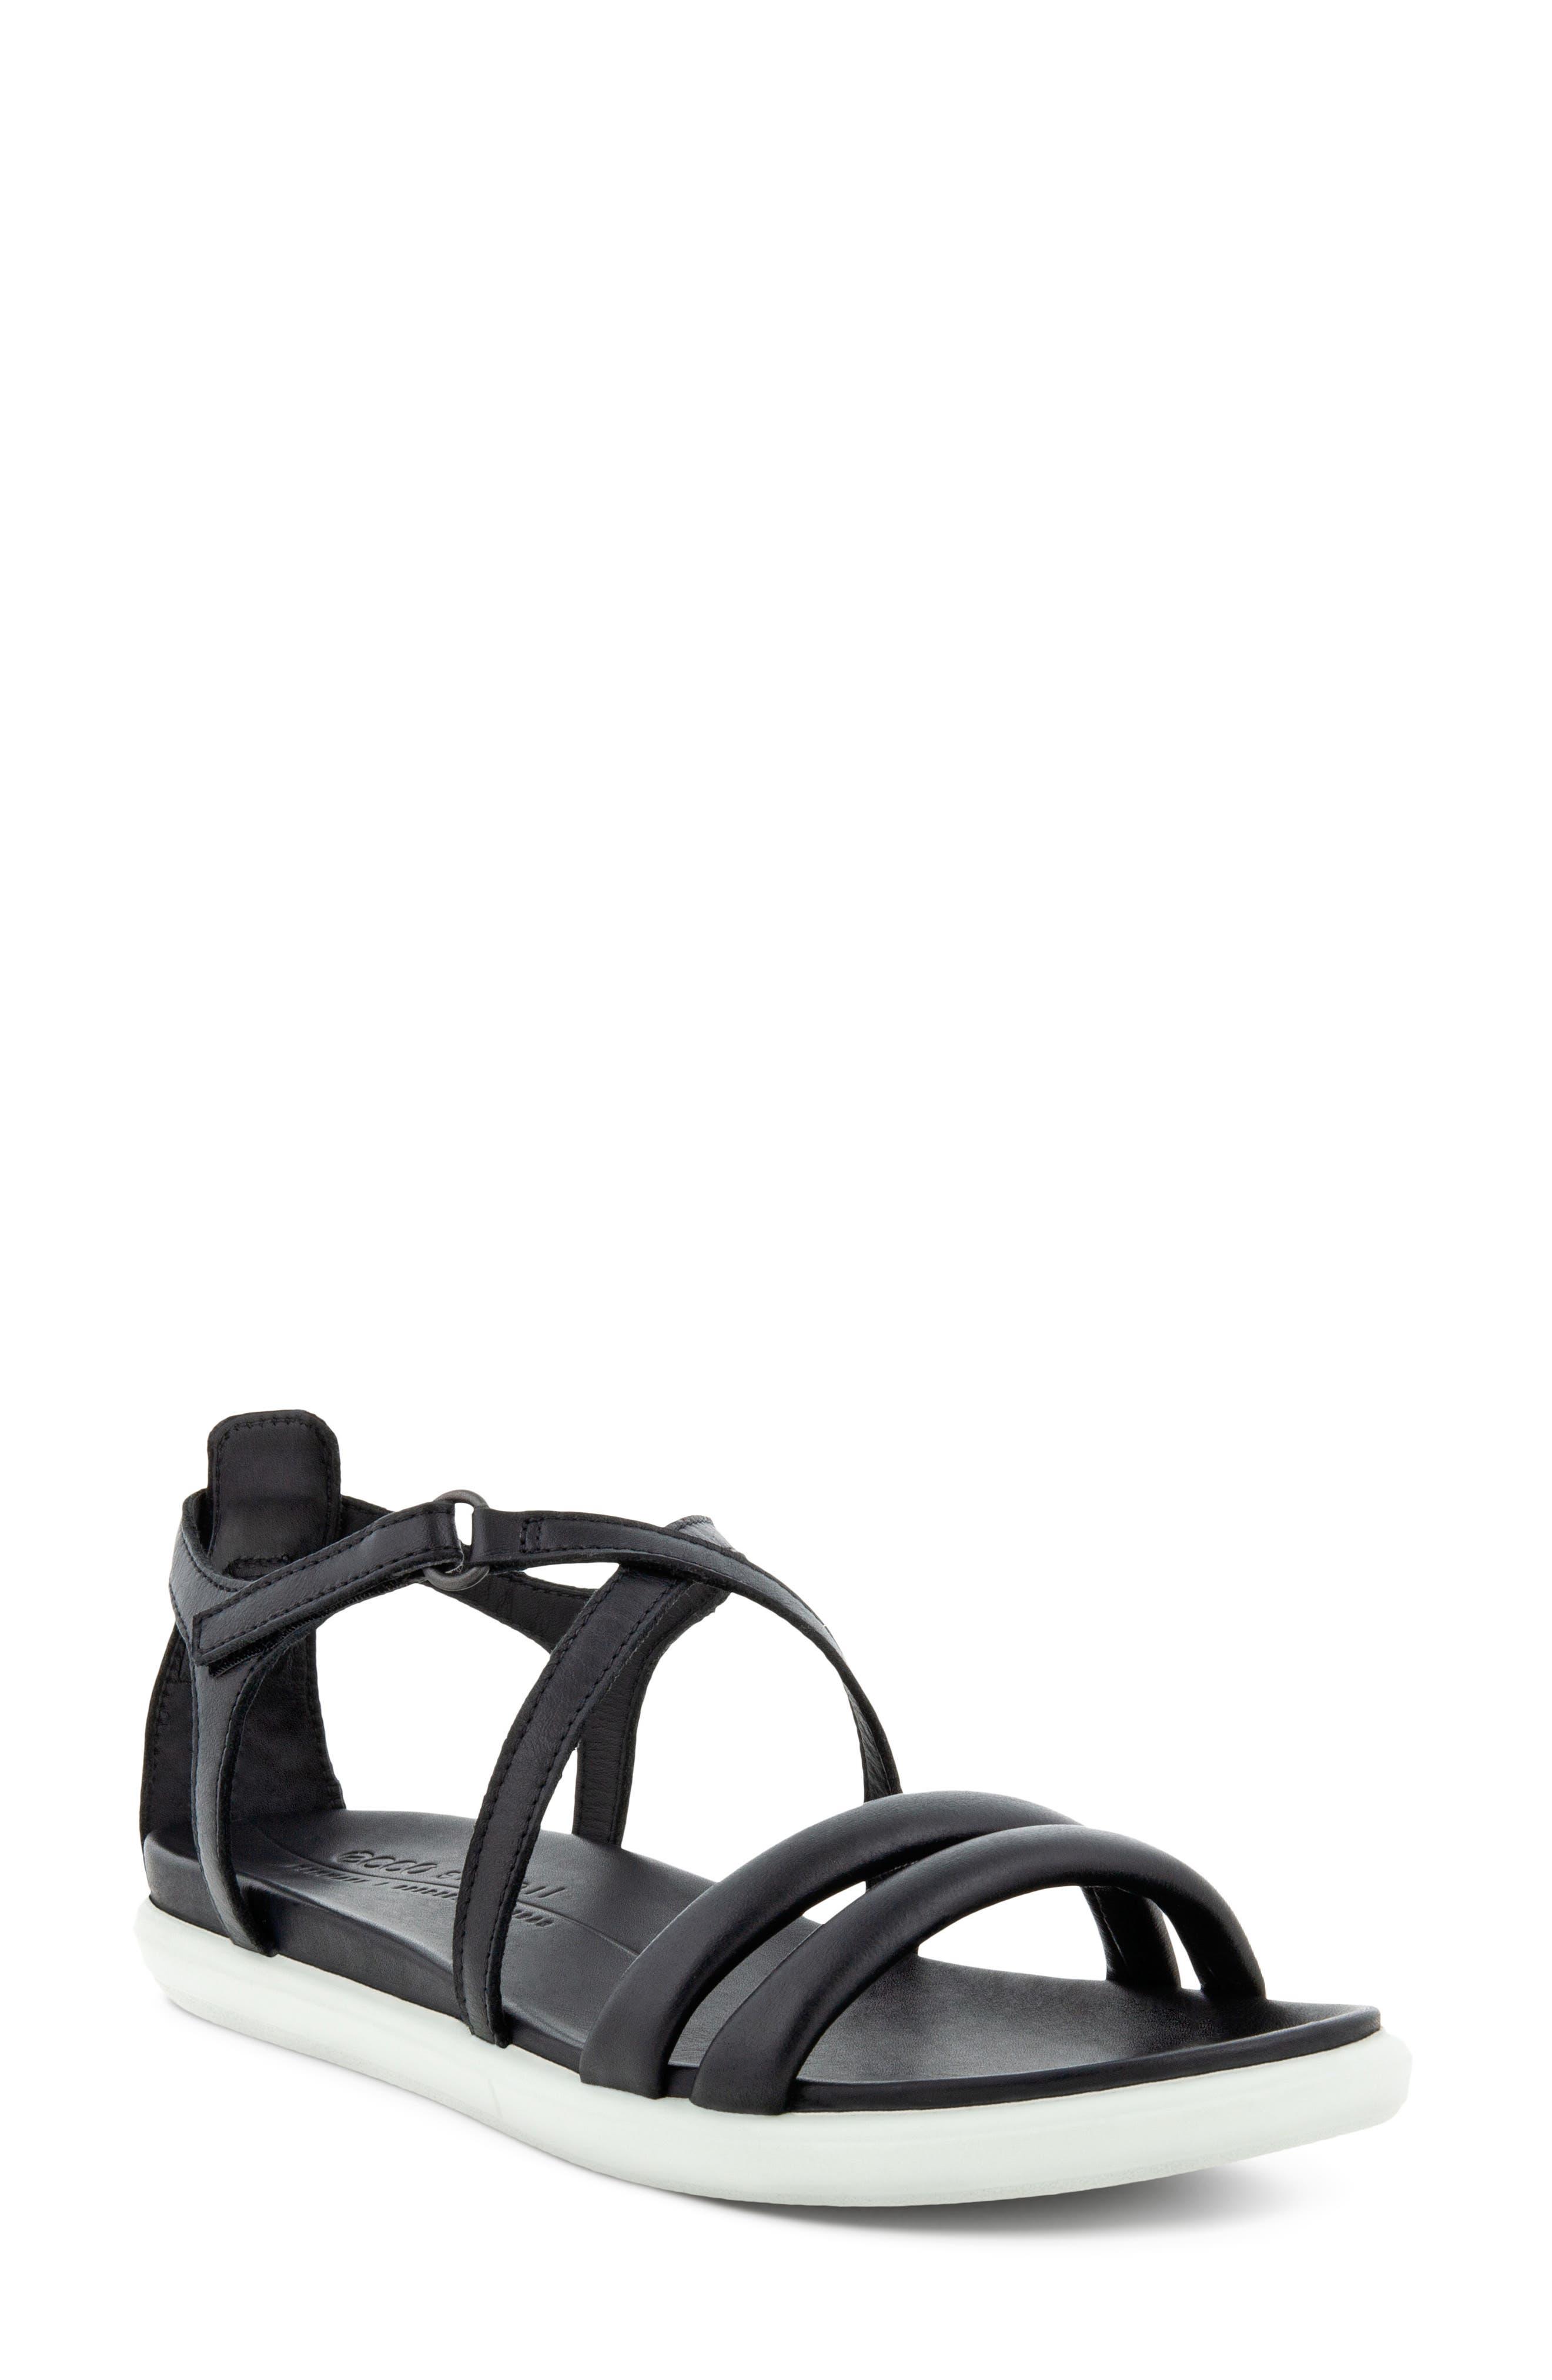 Women's Ecco Simpil Sandal